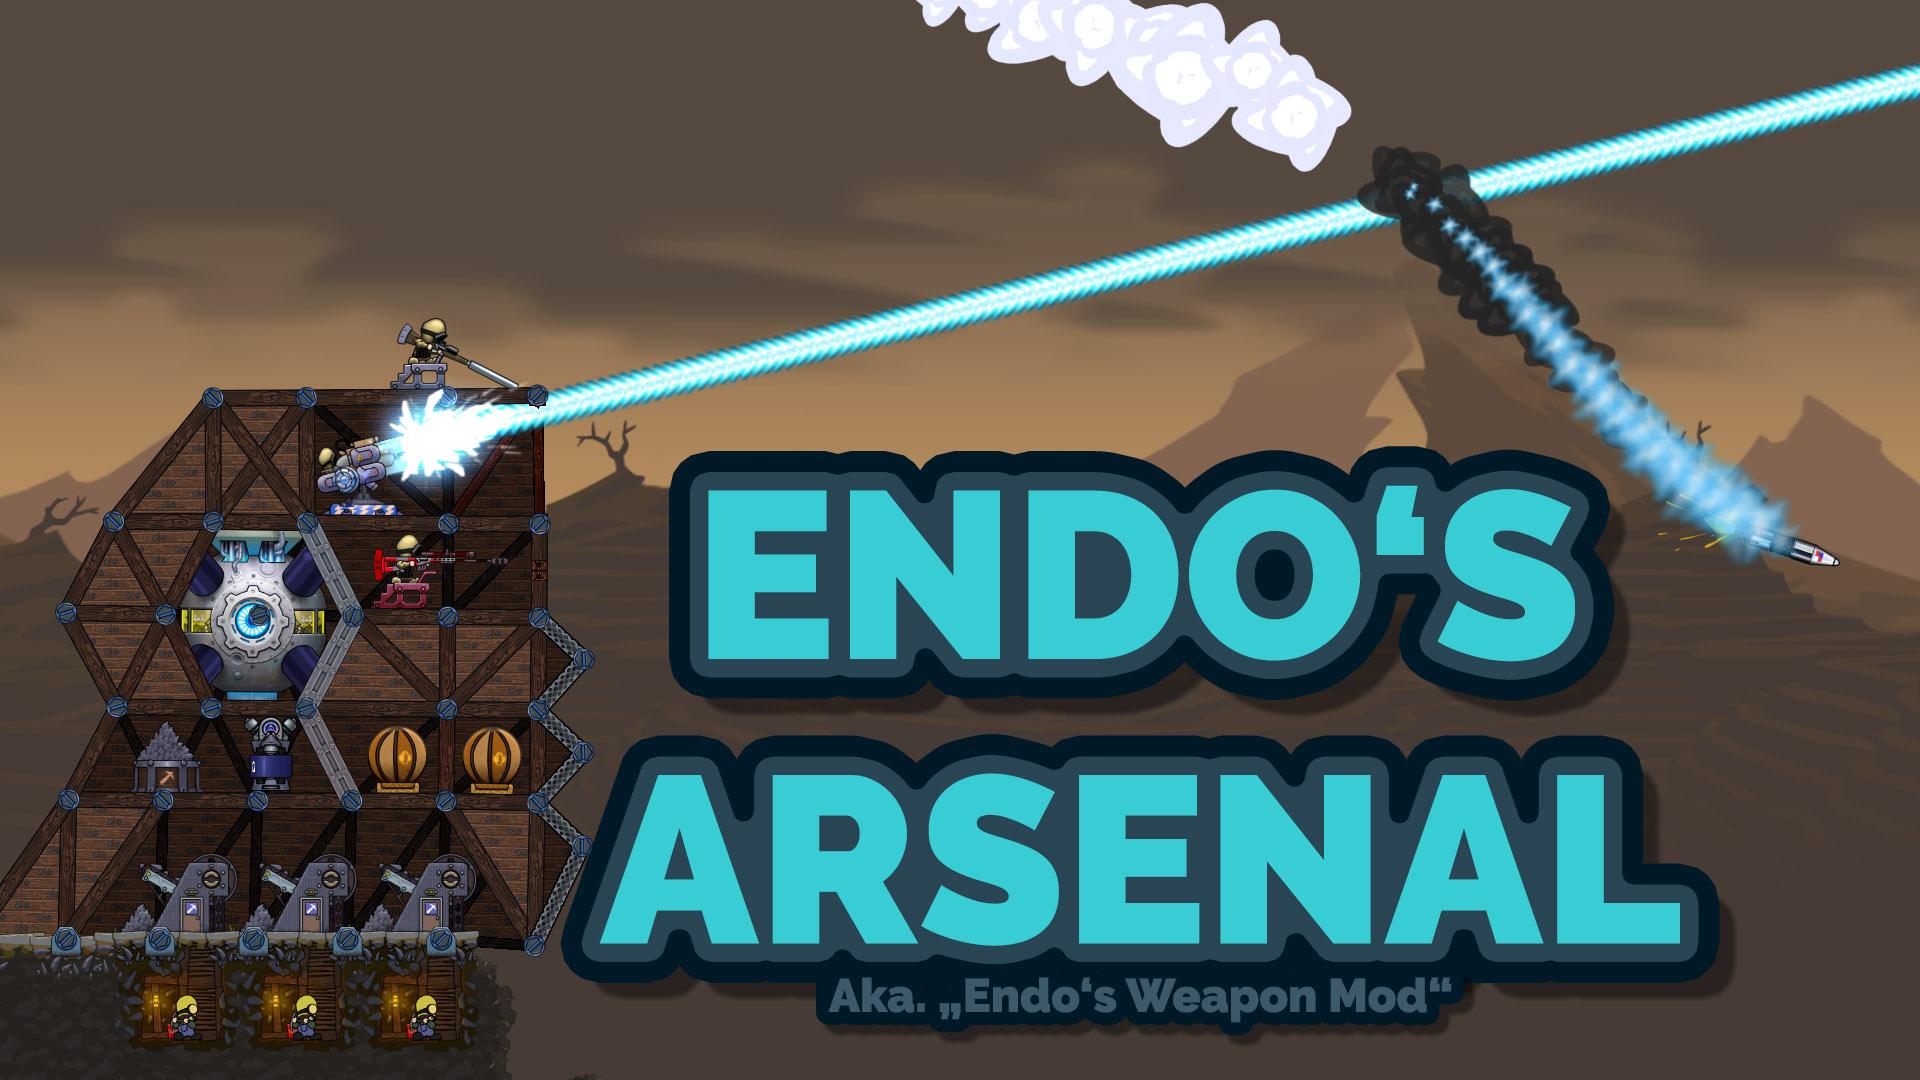 Endo's Arsenal